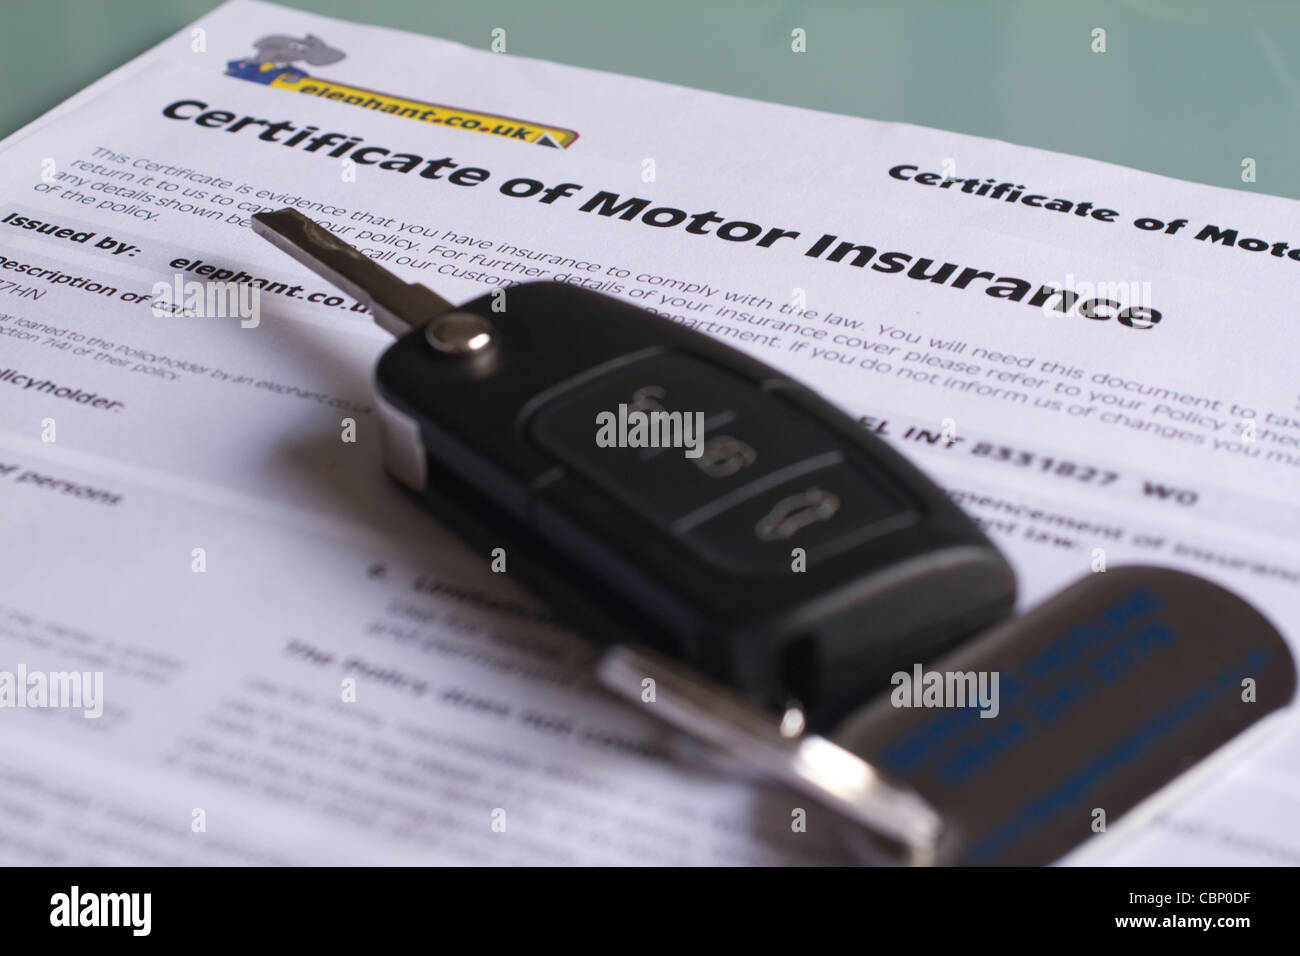 UK certificate of motor insurance, car insurance Stock Photo